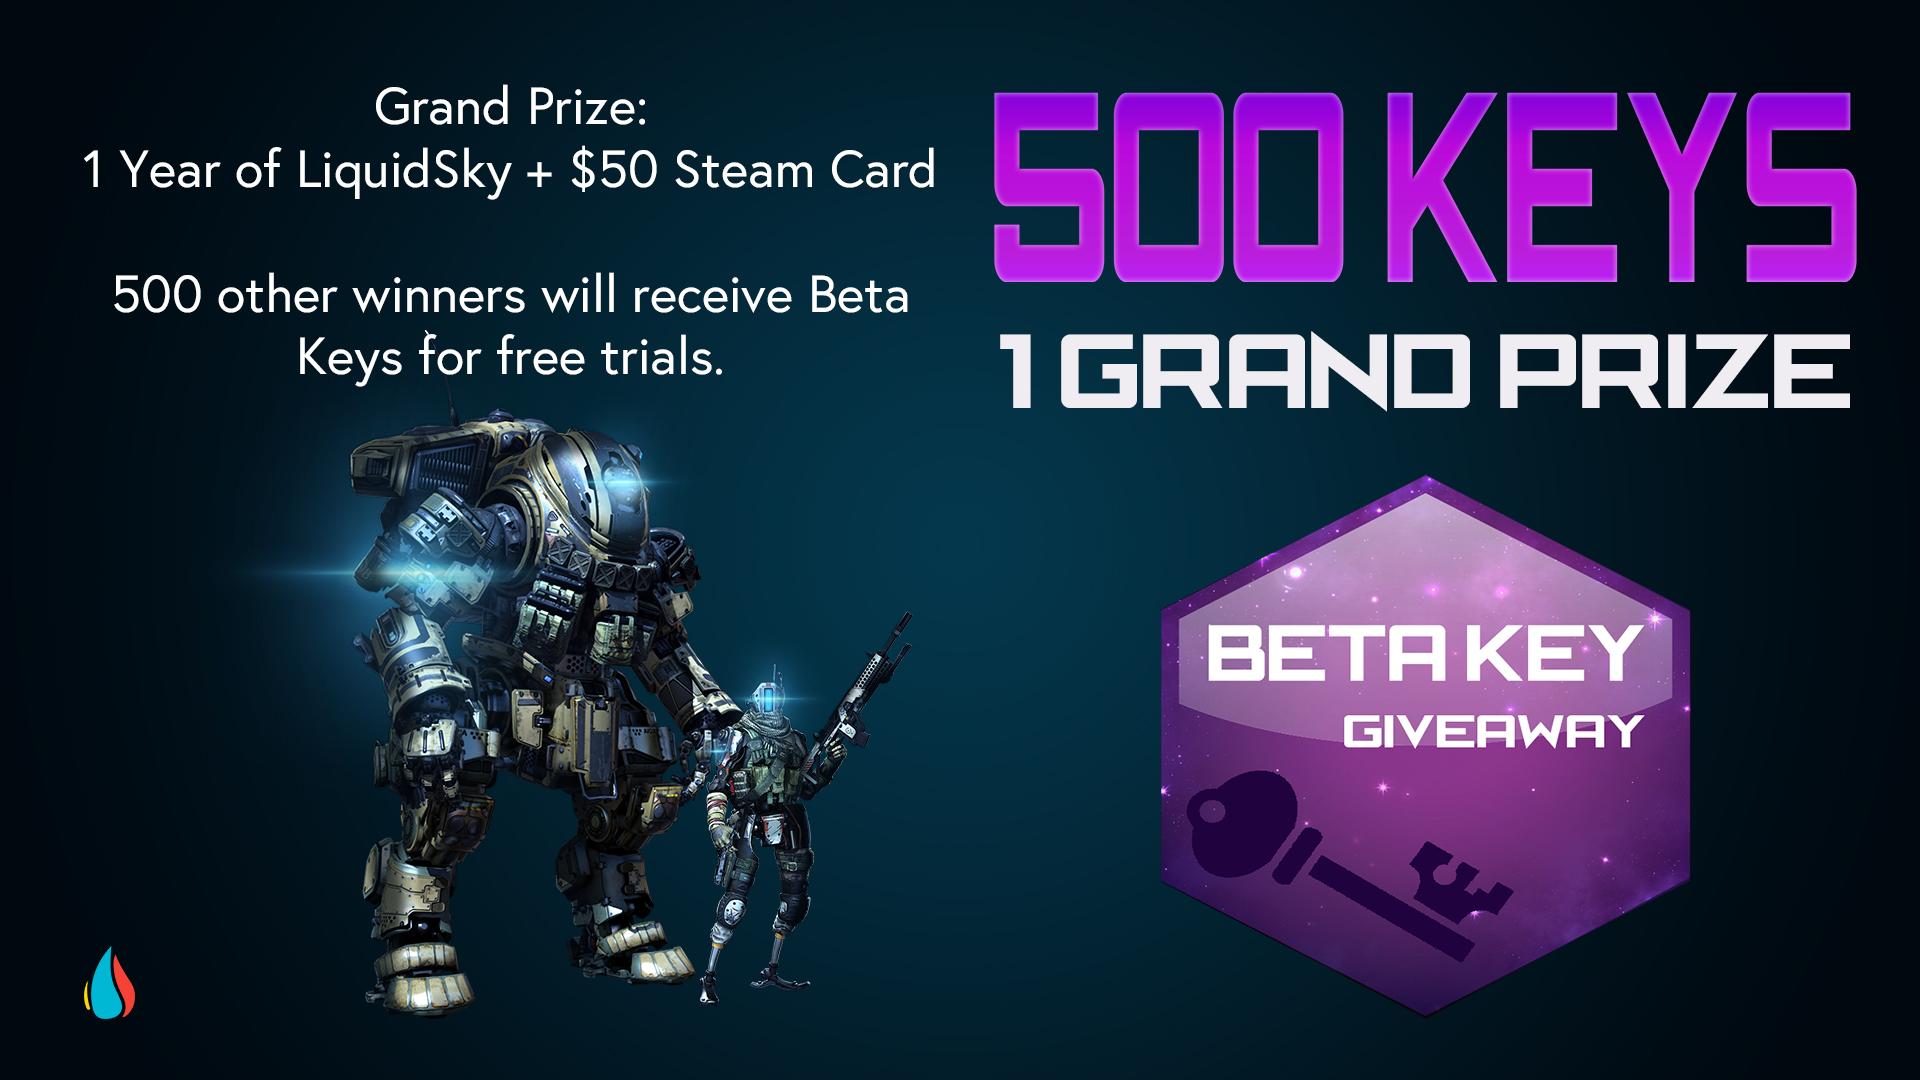 Beta giveaway